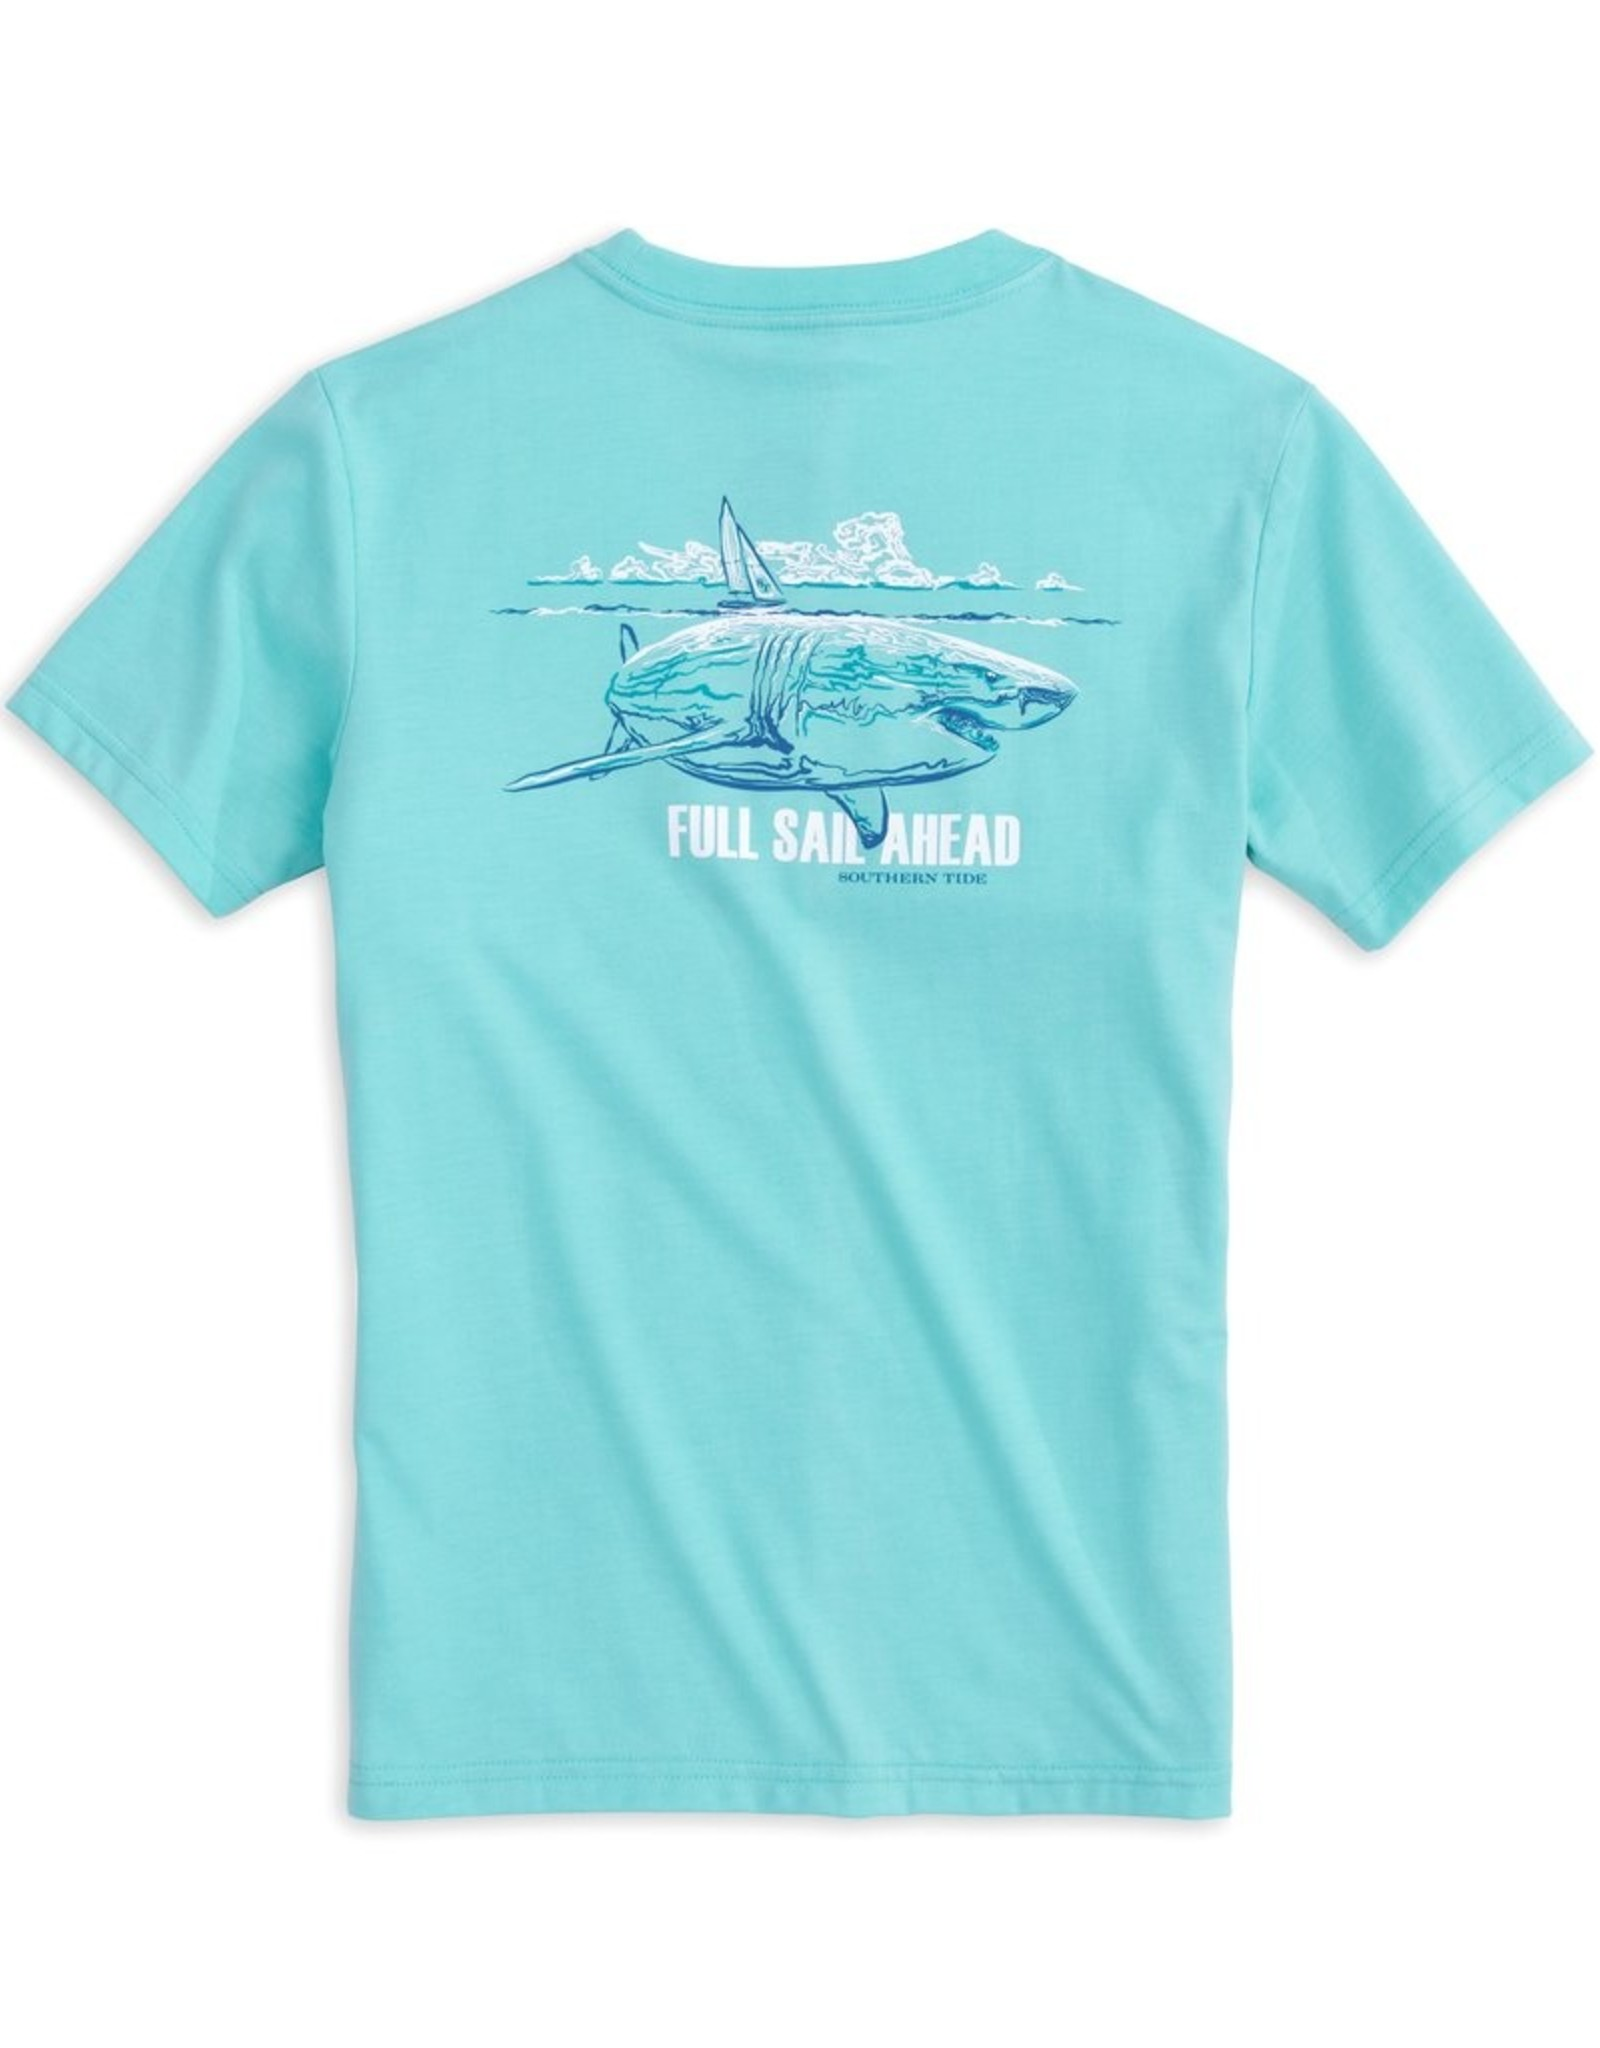 Southern Tide Full Sail Ahead Tee, Crystal Blue